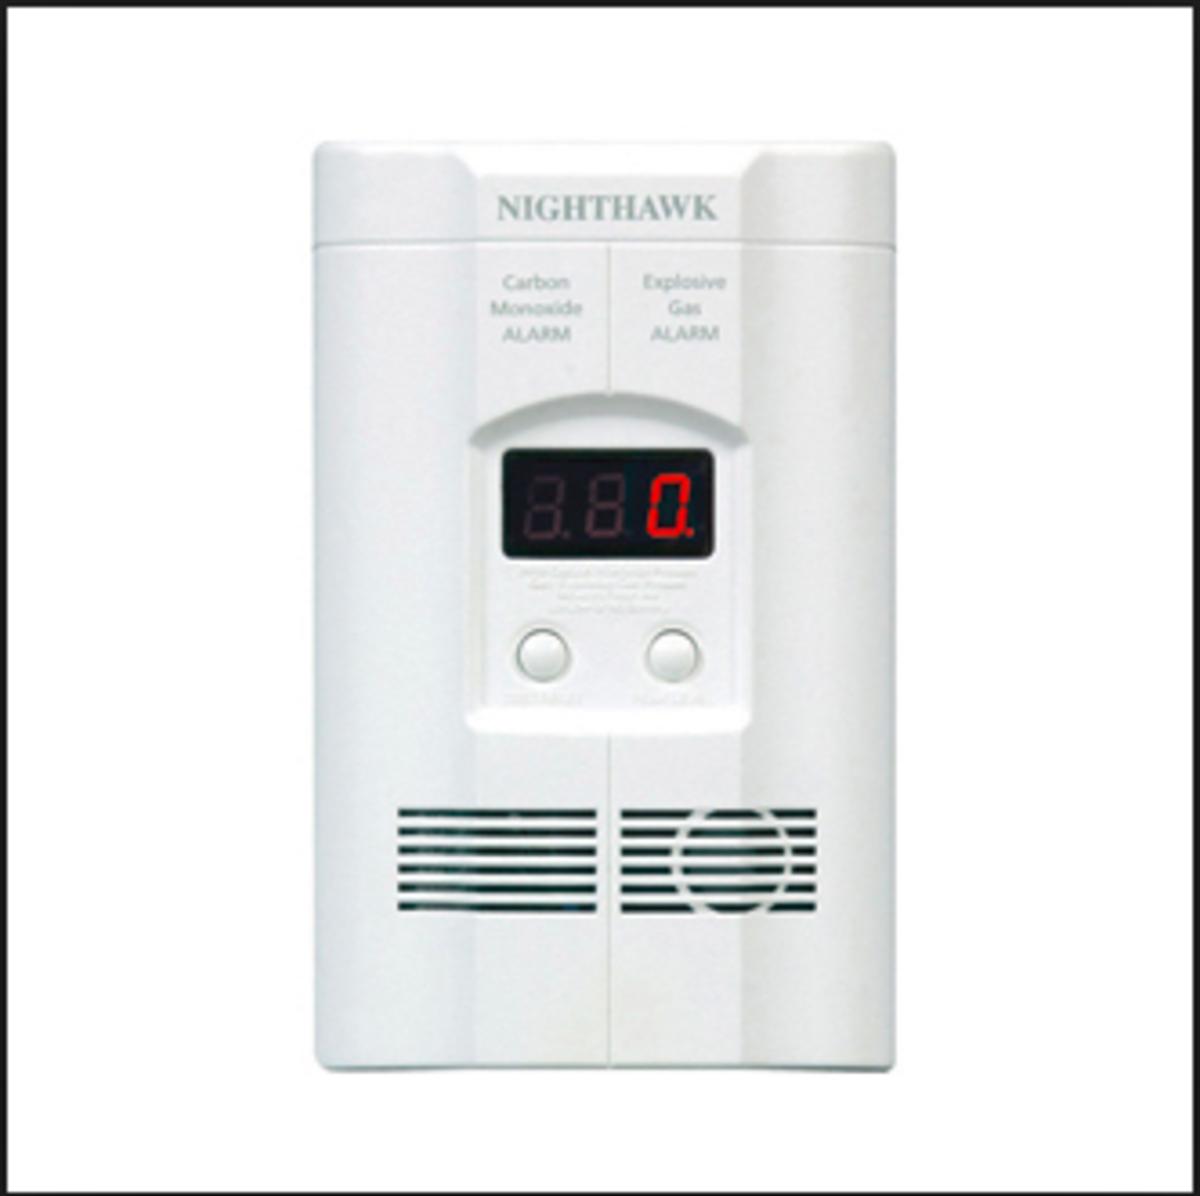 The Nighthawk detector.